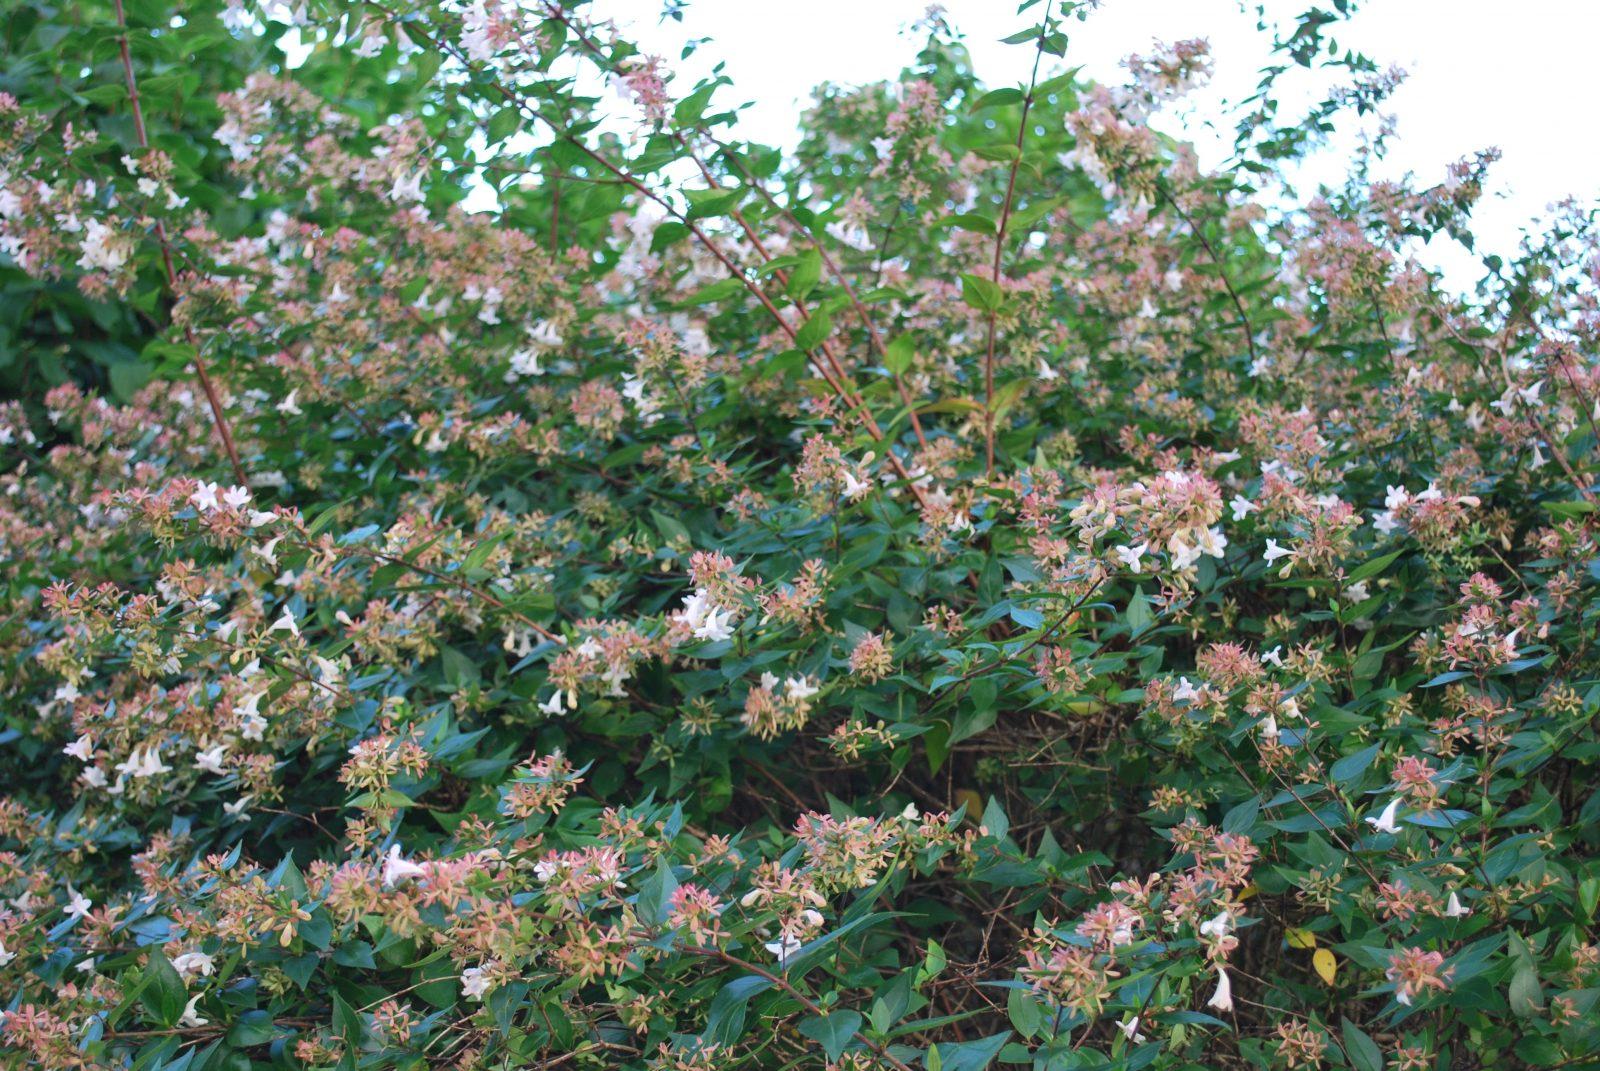 Abelia Grandiflora Garden Shrub For Sale Uk Letsgoplanting Couk